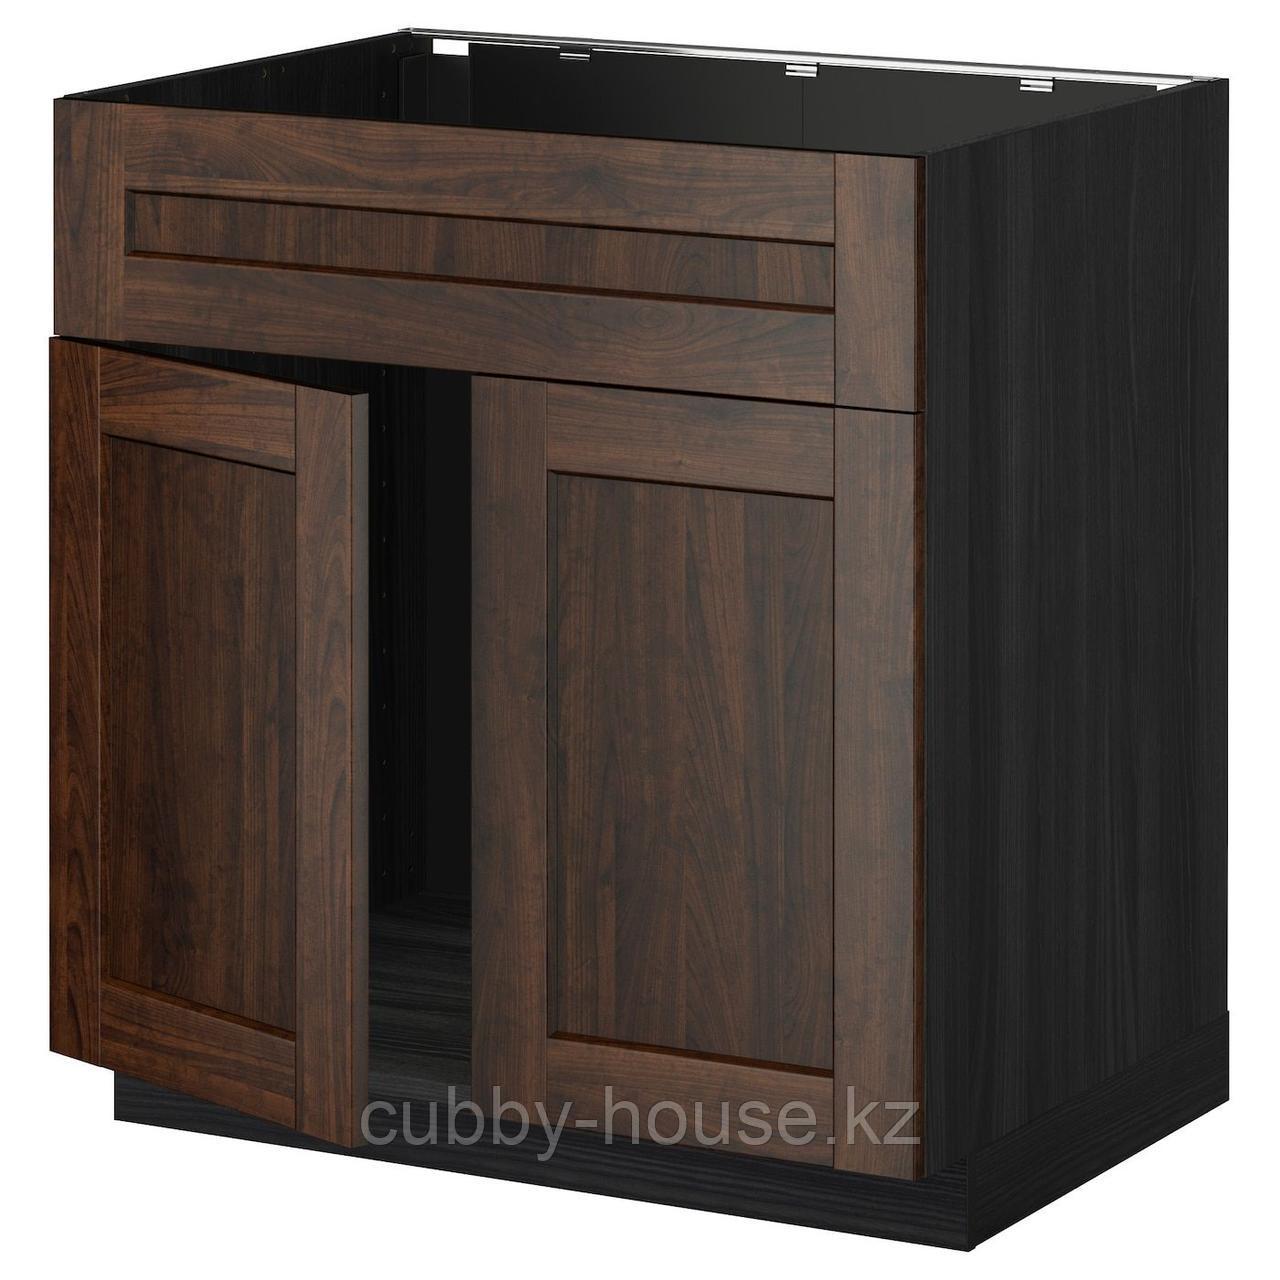 МЕТОД Напольн шкаф п-мойку 2 двр/фрн пнл, белый, Будбин серый, 80x60 см